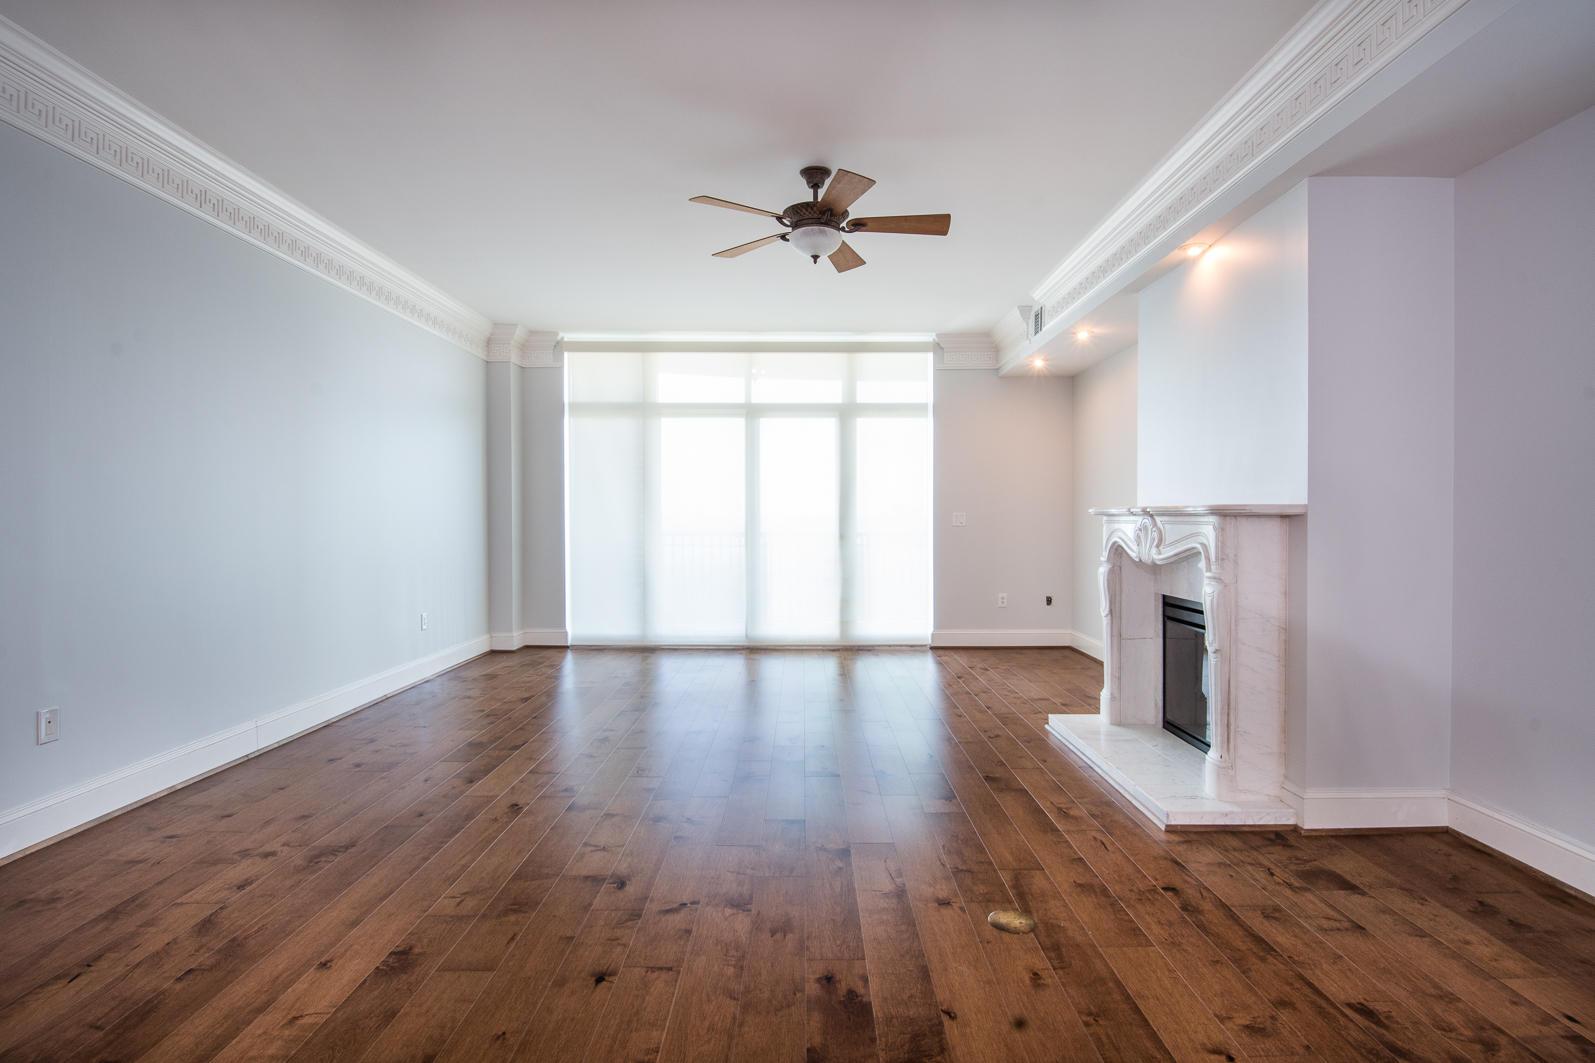 Renaissance On Chas Harbor Homes For Sale - 144 Plaza, Mount Pleasant, SC - 9